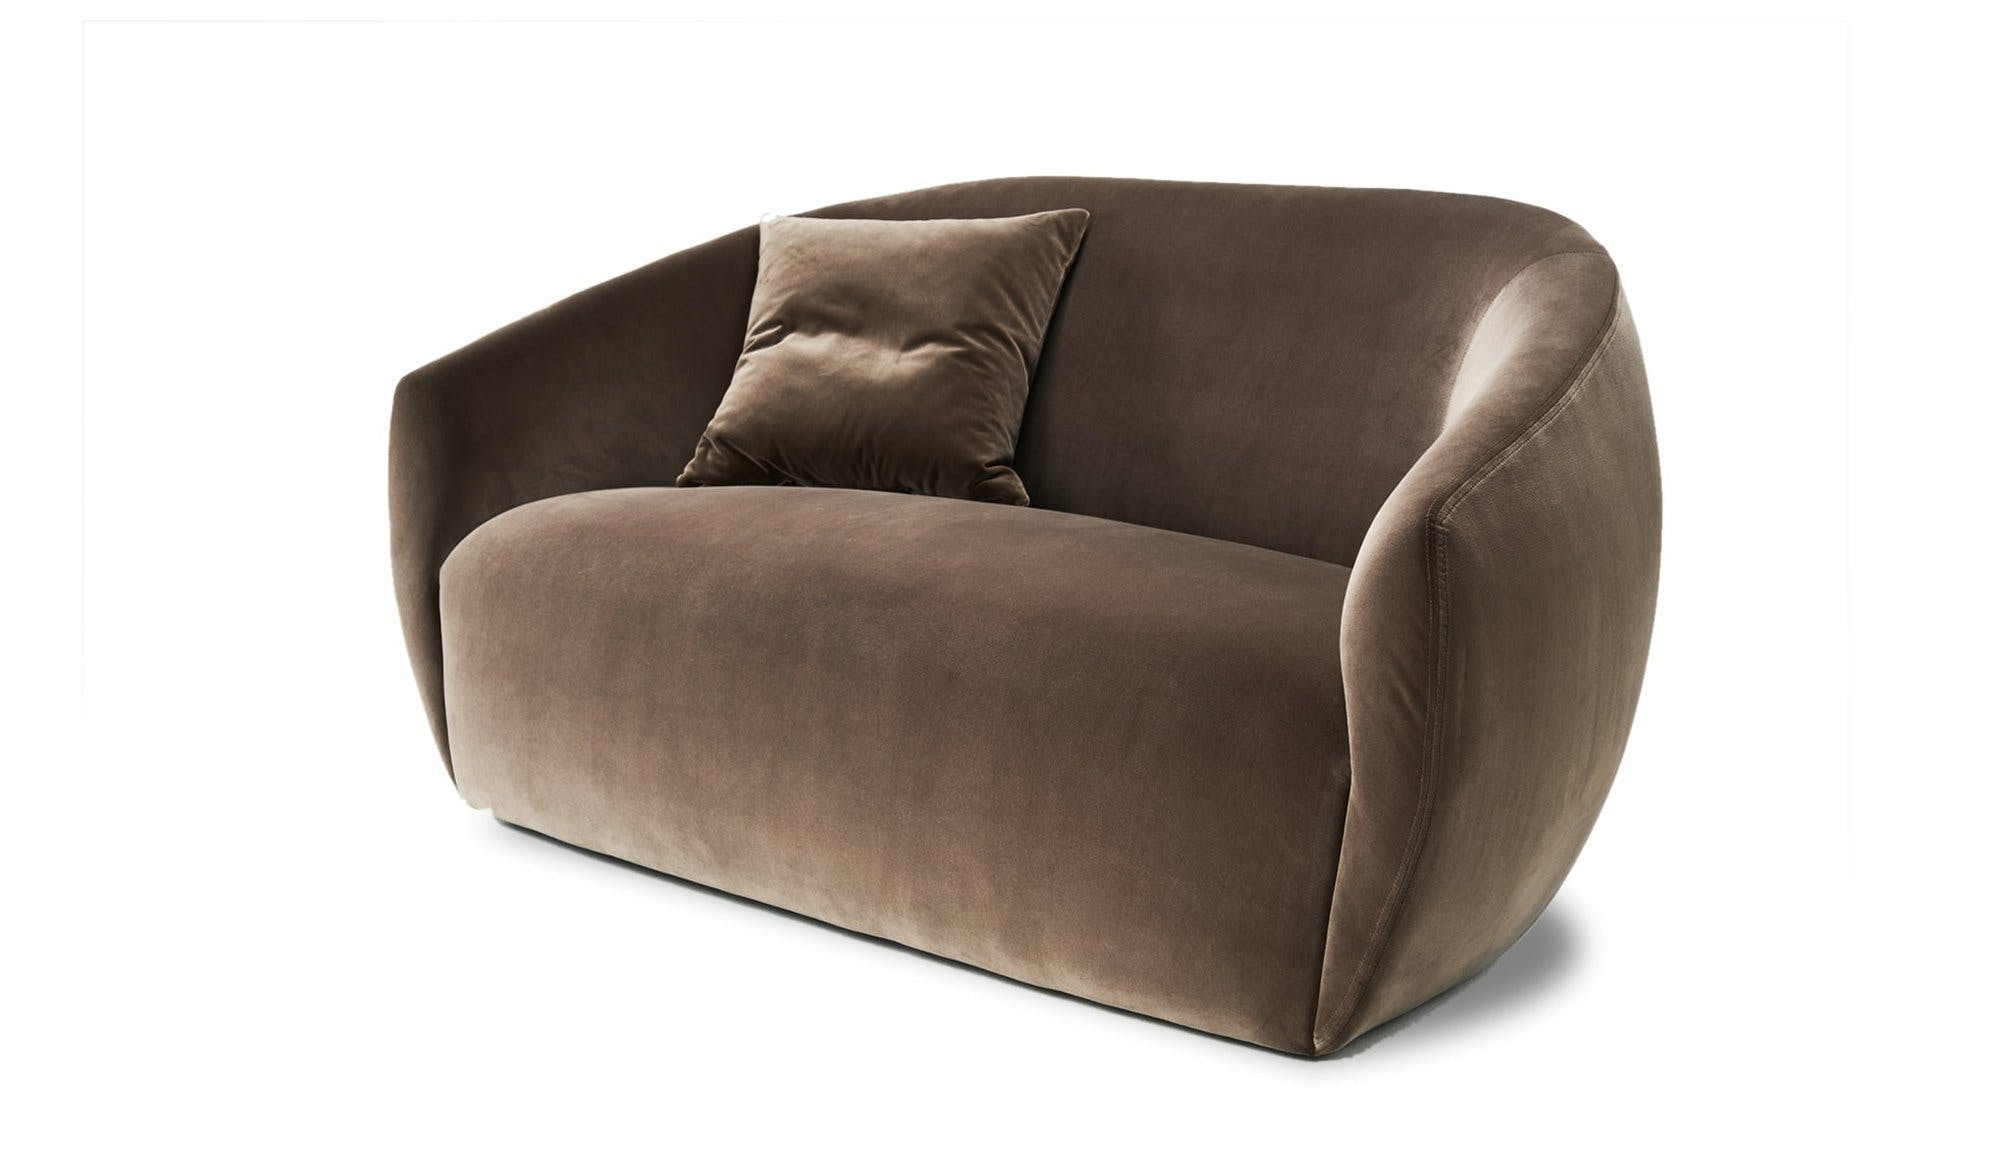 Wendelbo Lobby Lounge Chair1 2000X